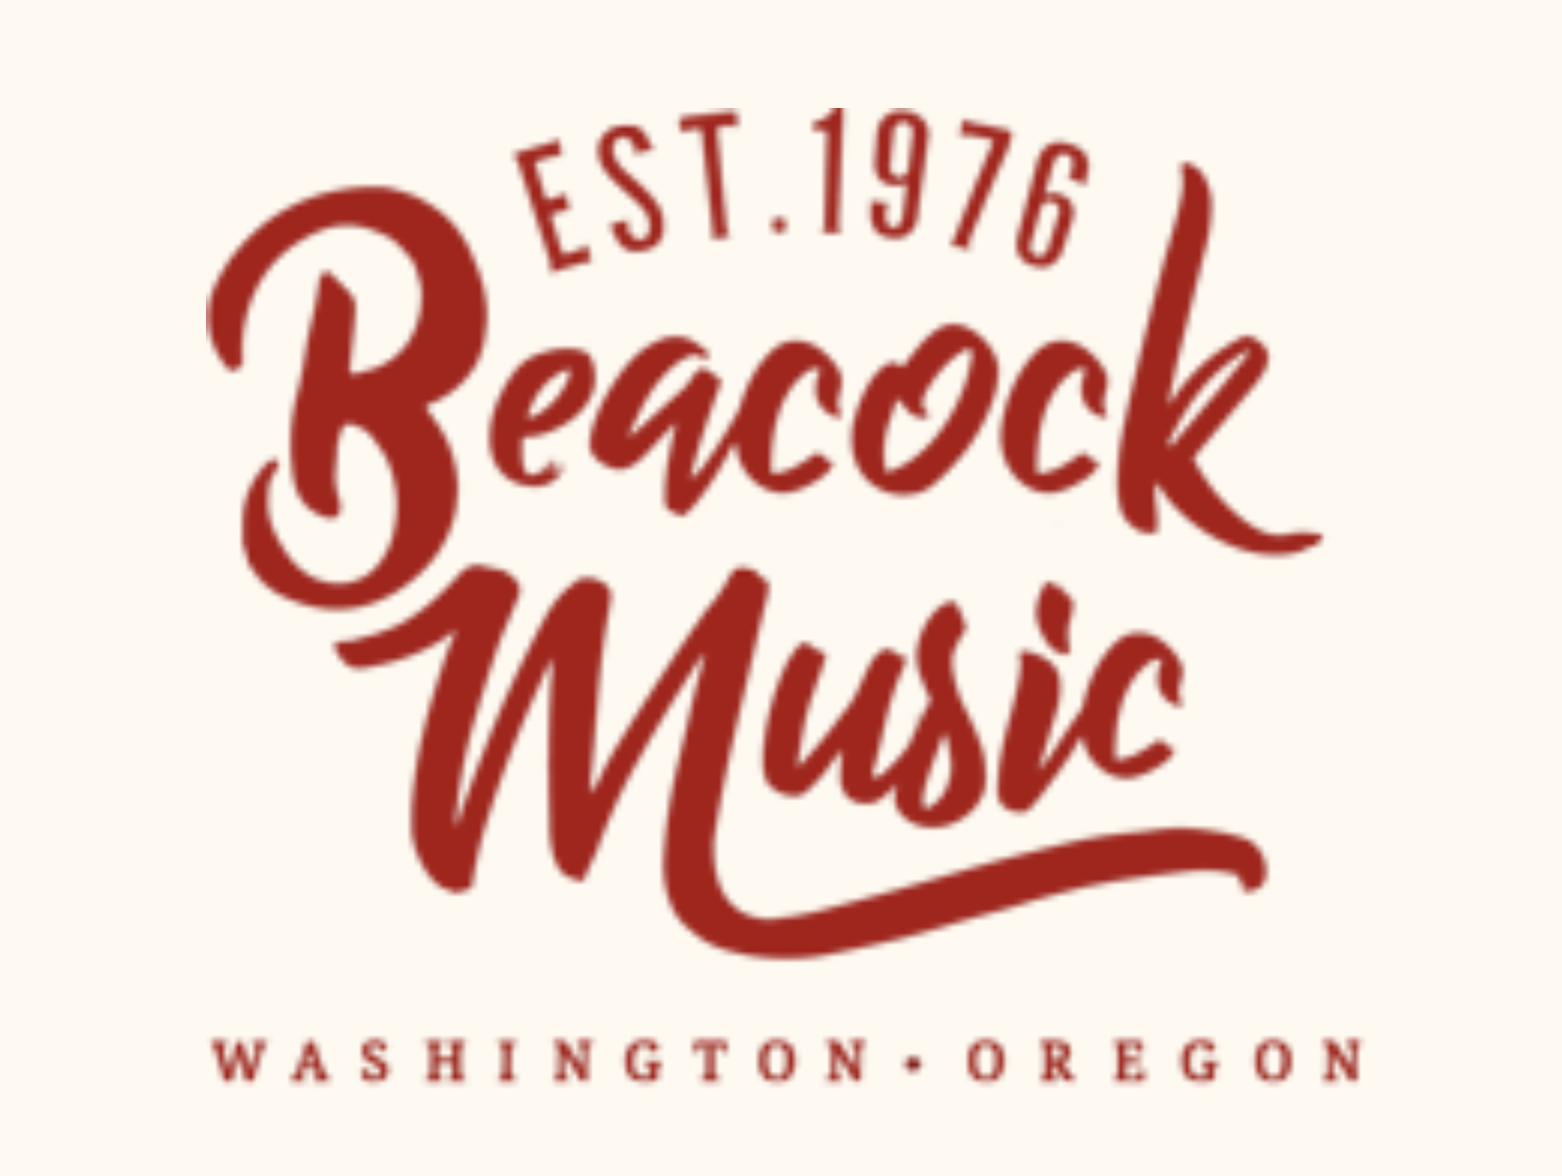 Beacock Music - Eugene  Amadeus Flutes